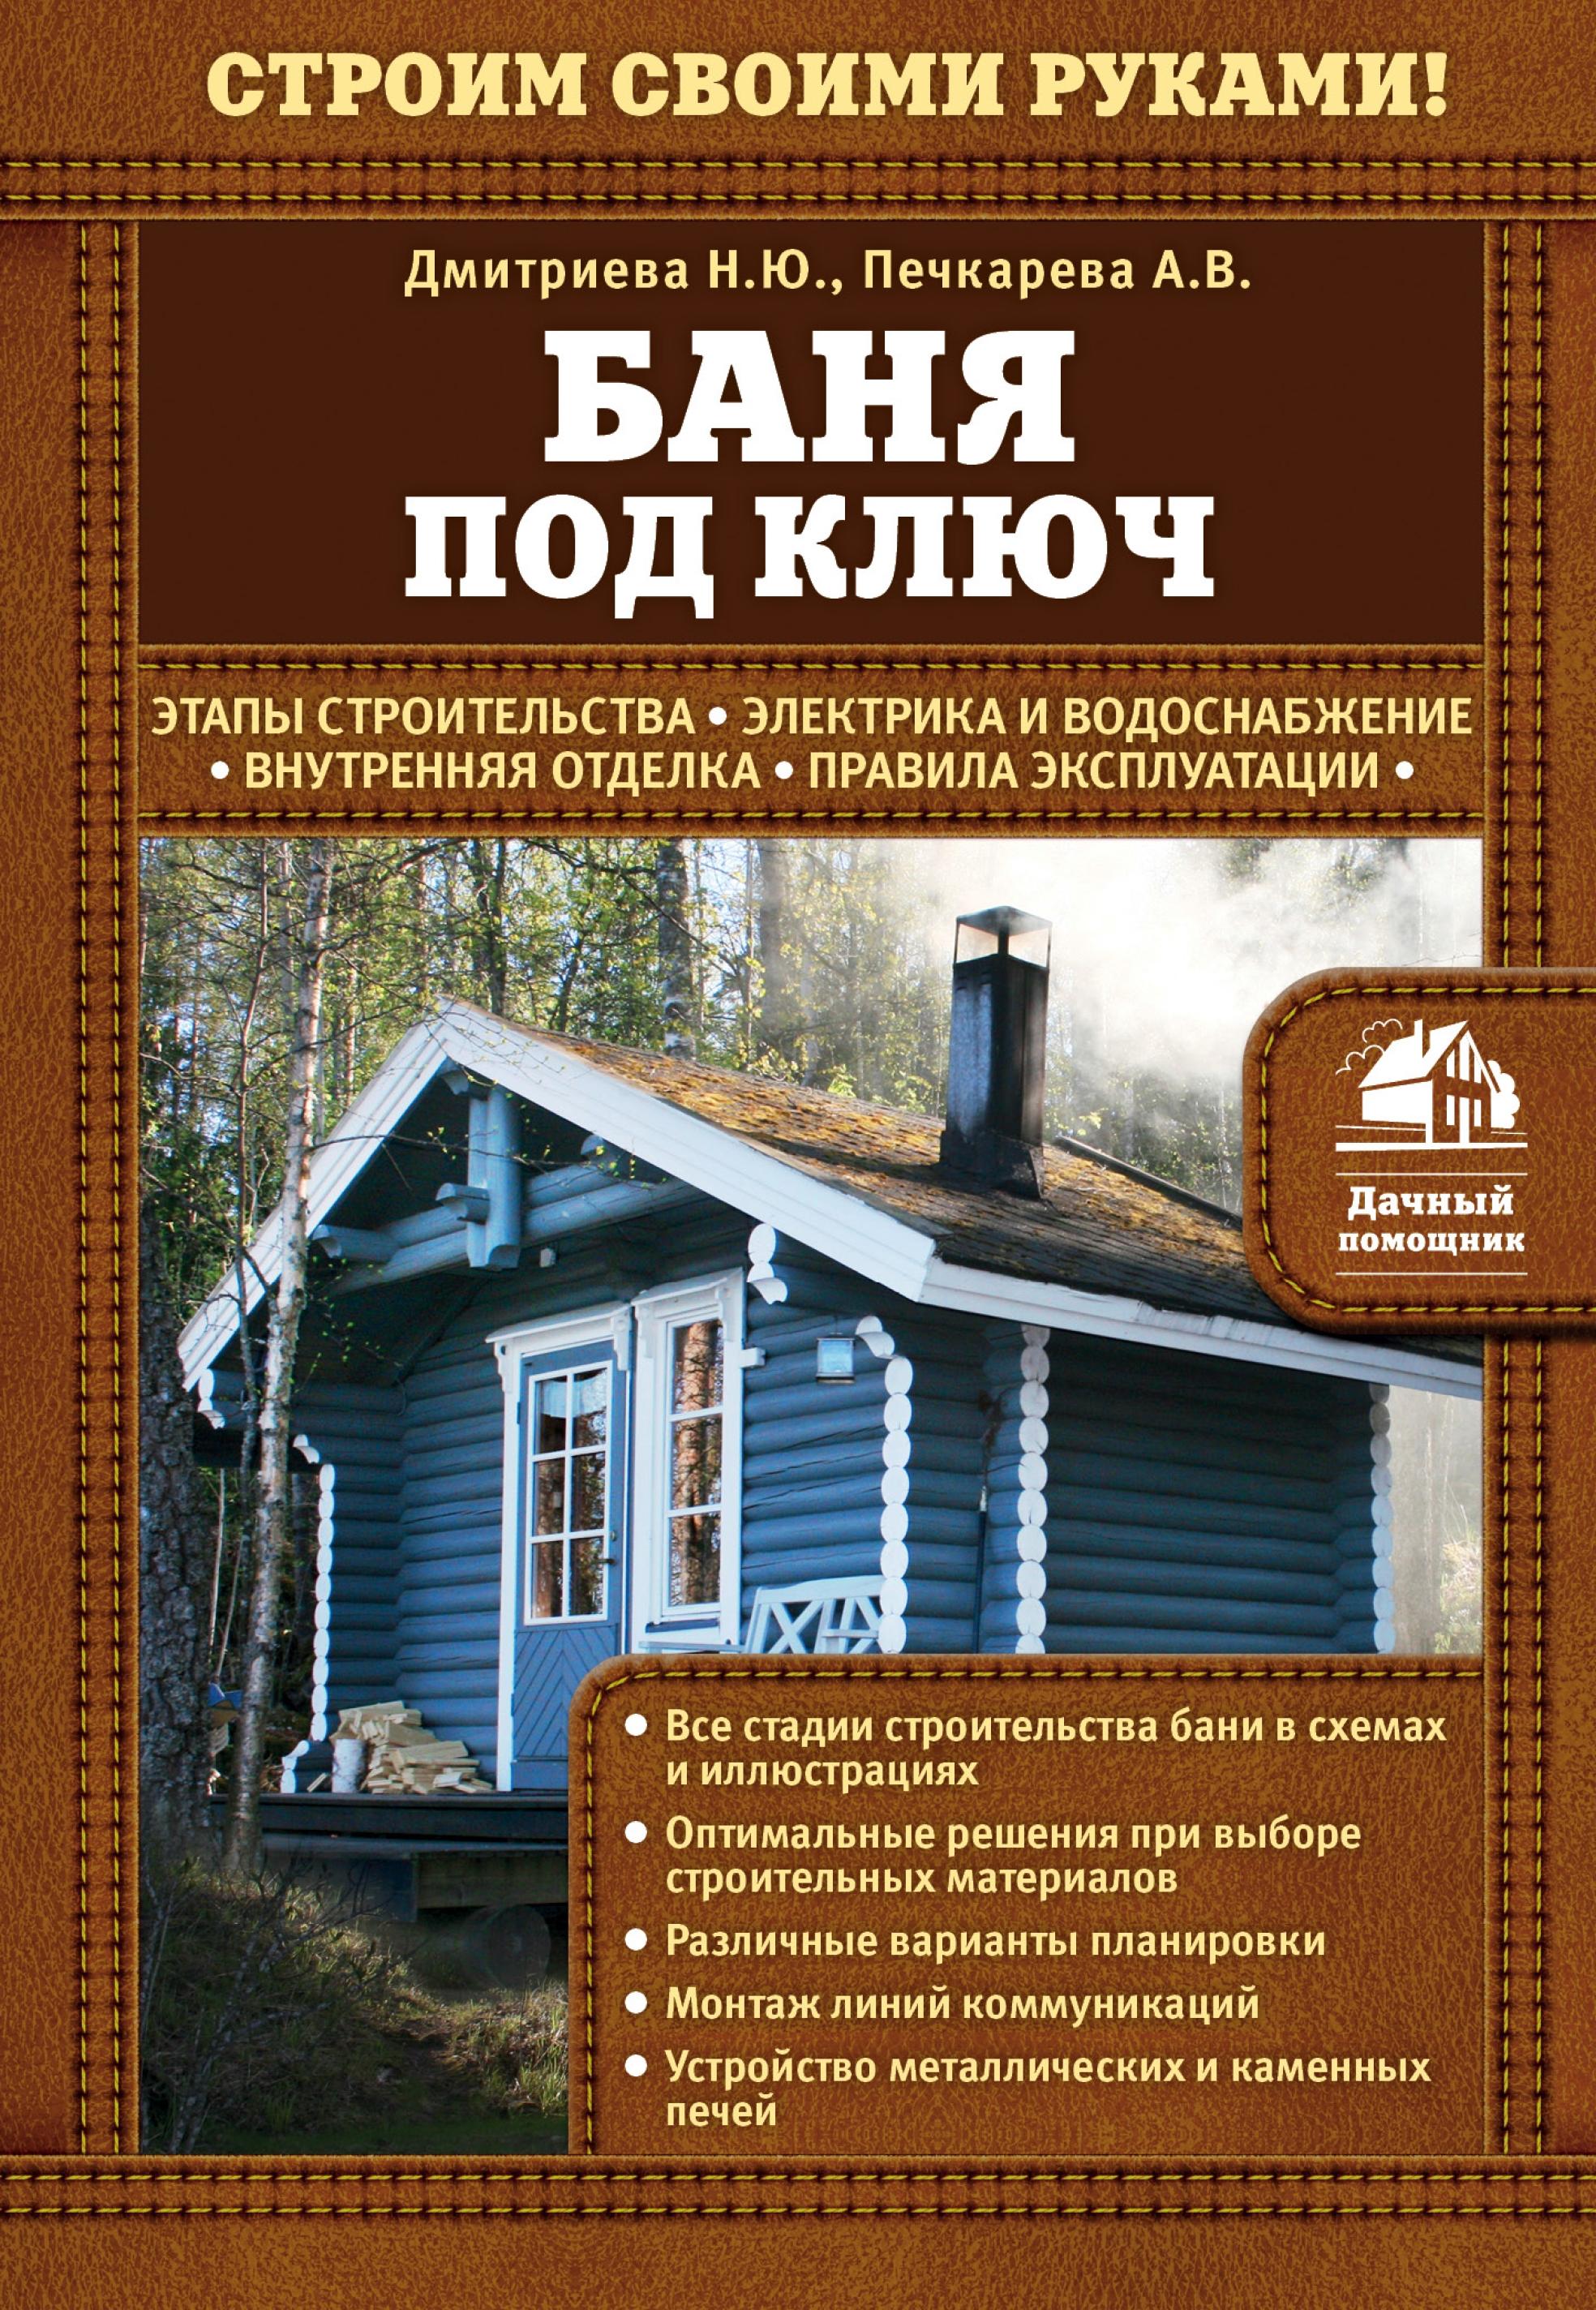 Н. Ю. Дмитриева Баня под ключ морозов ю ремонт дачного дома своими руками полное руководство